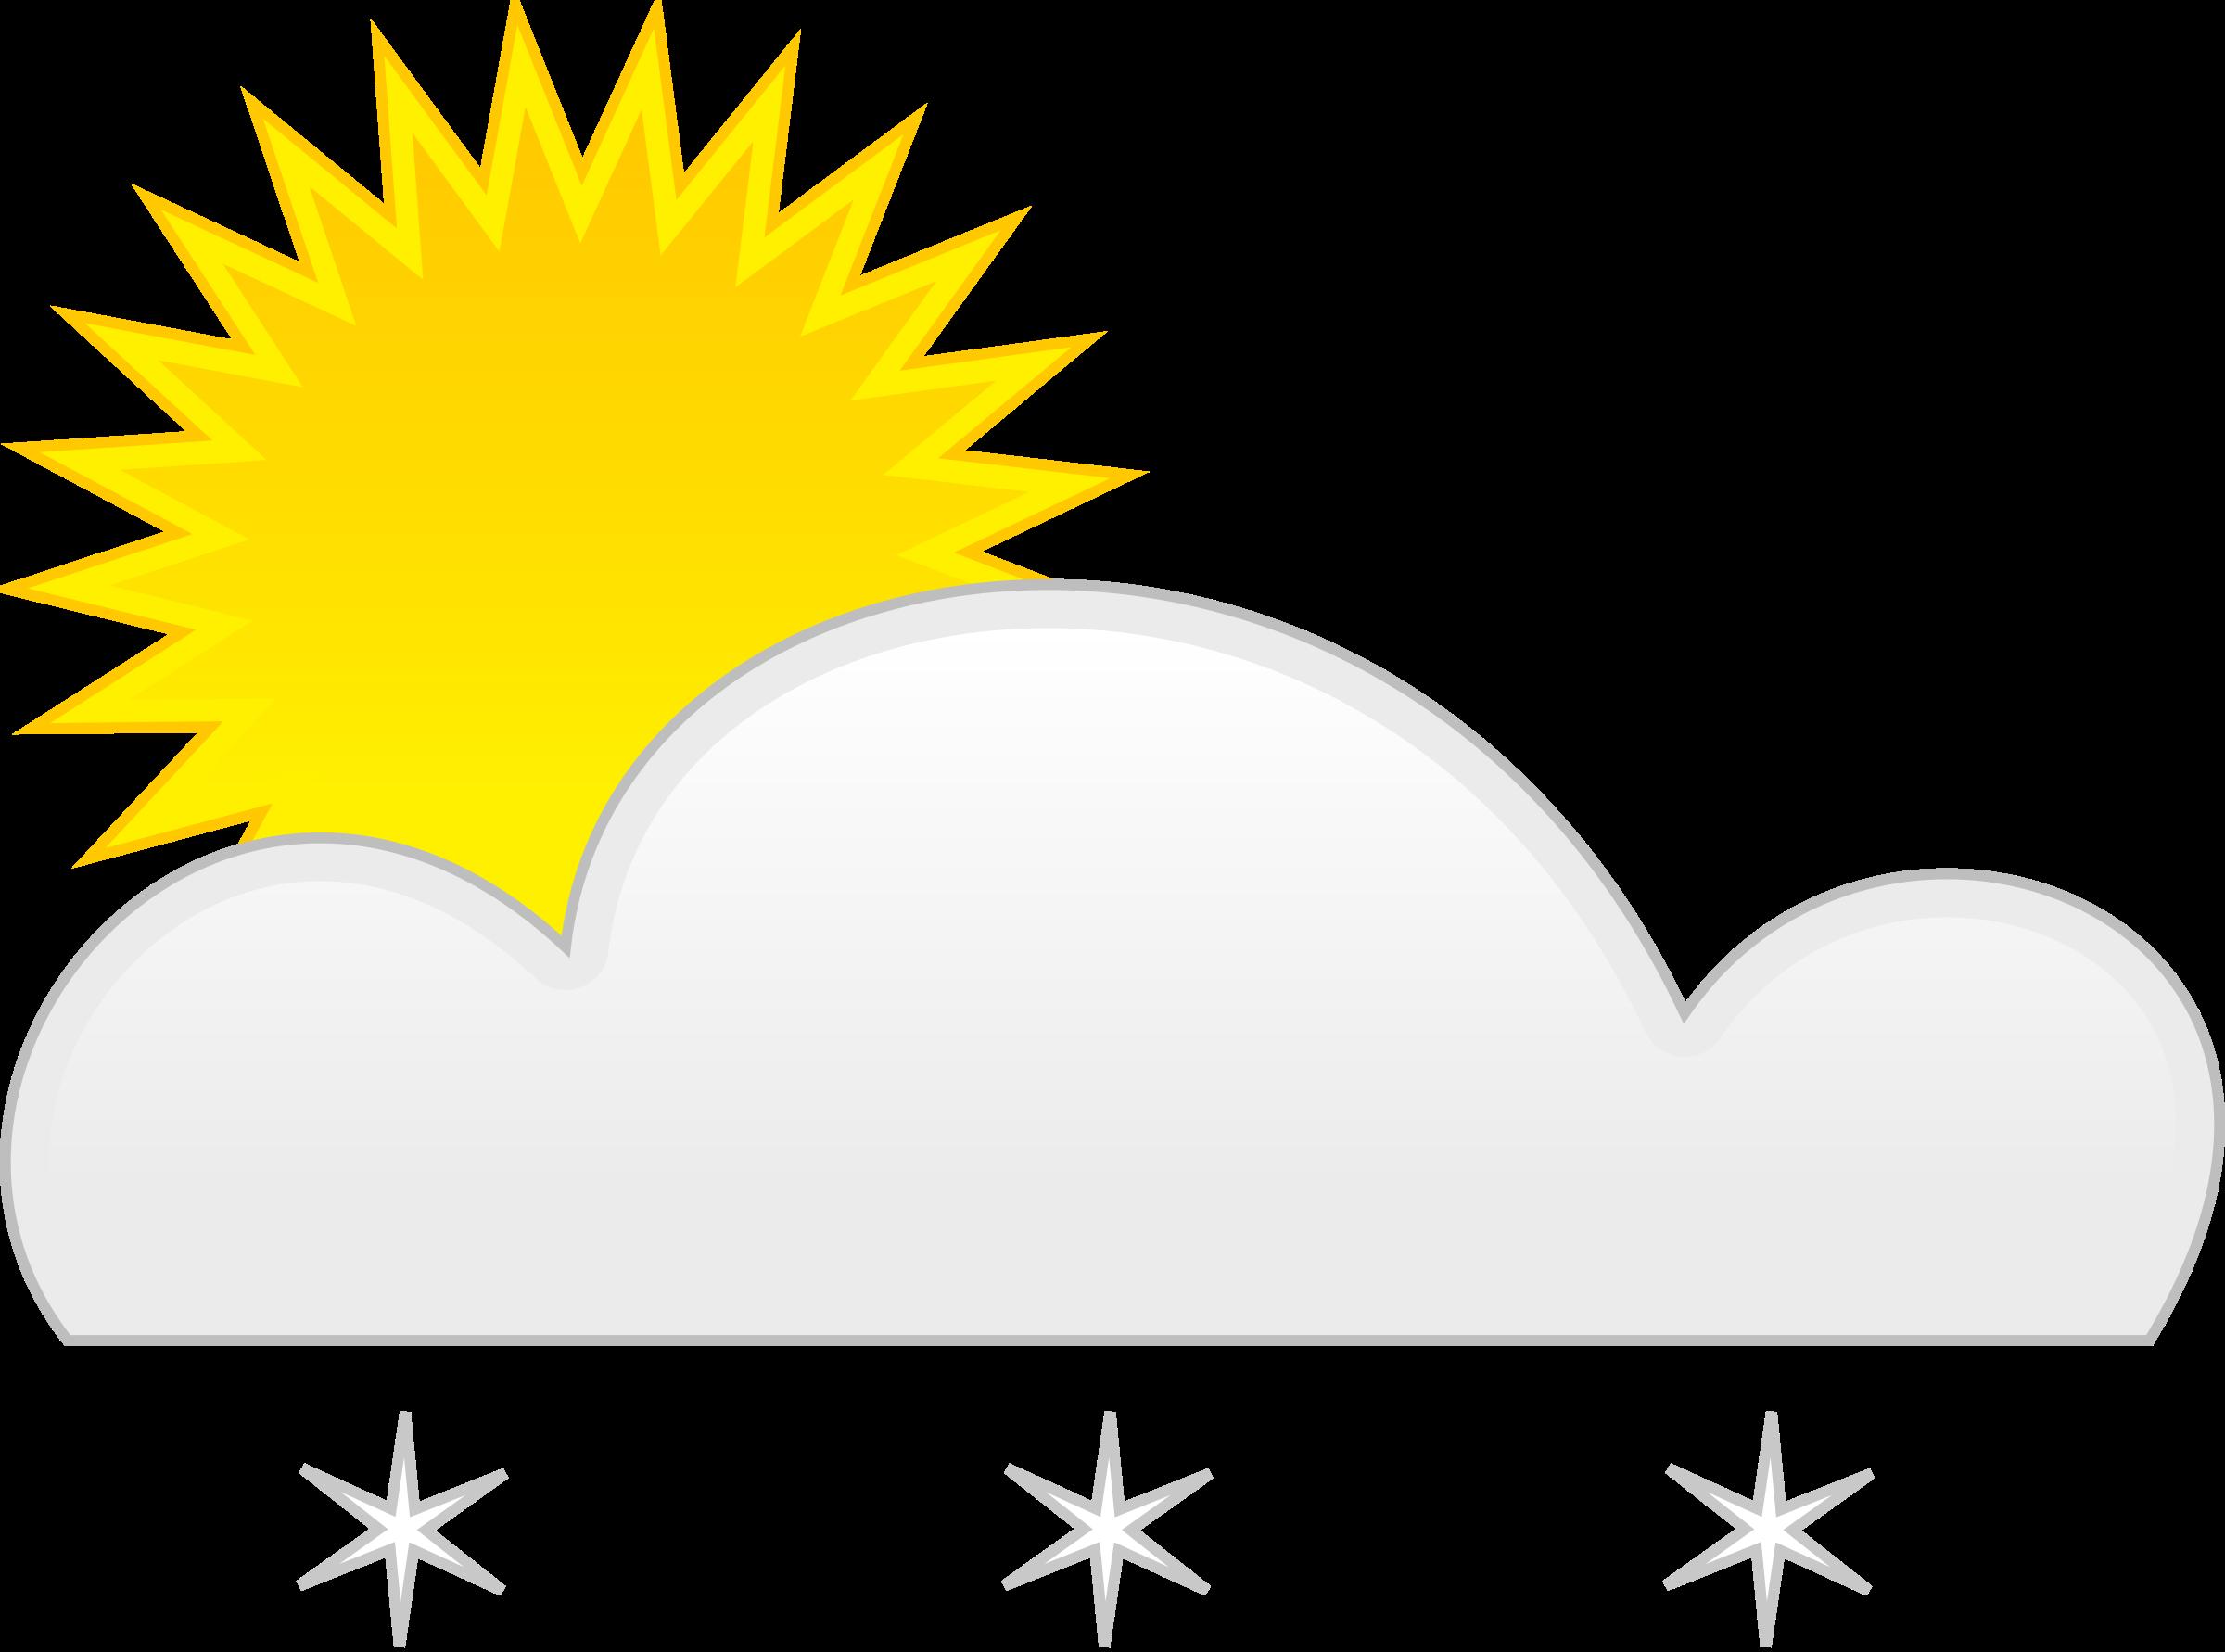 Clipart sun snow. Big image png